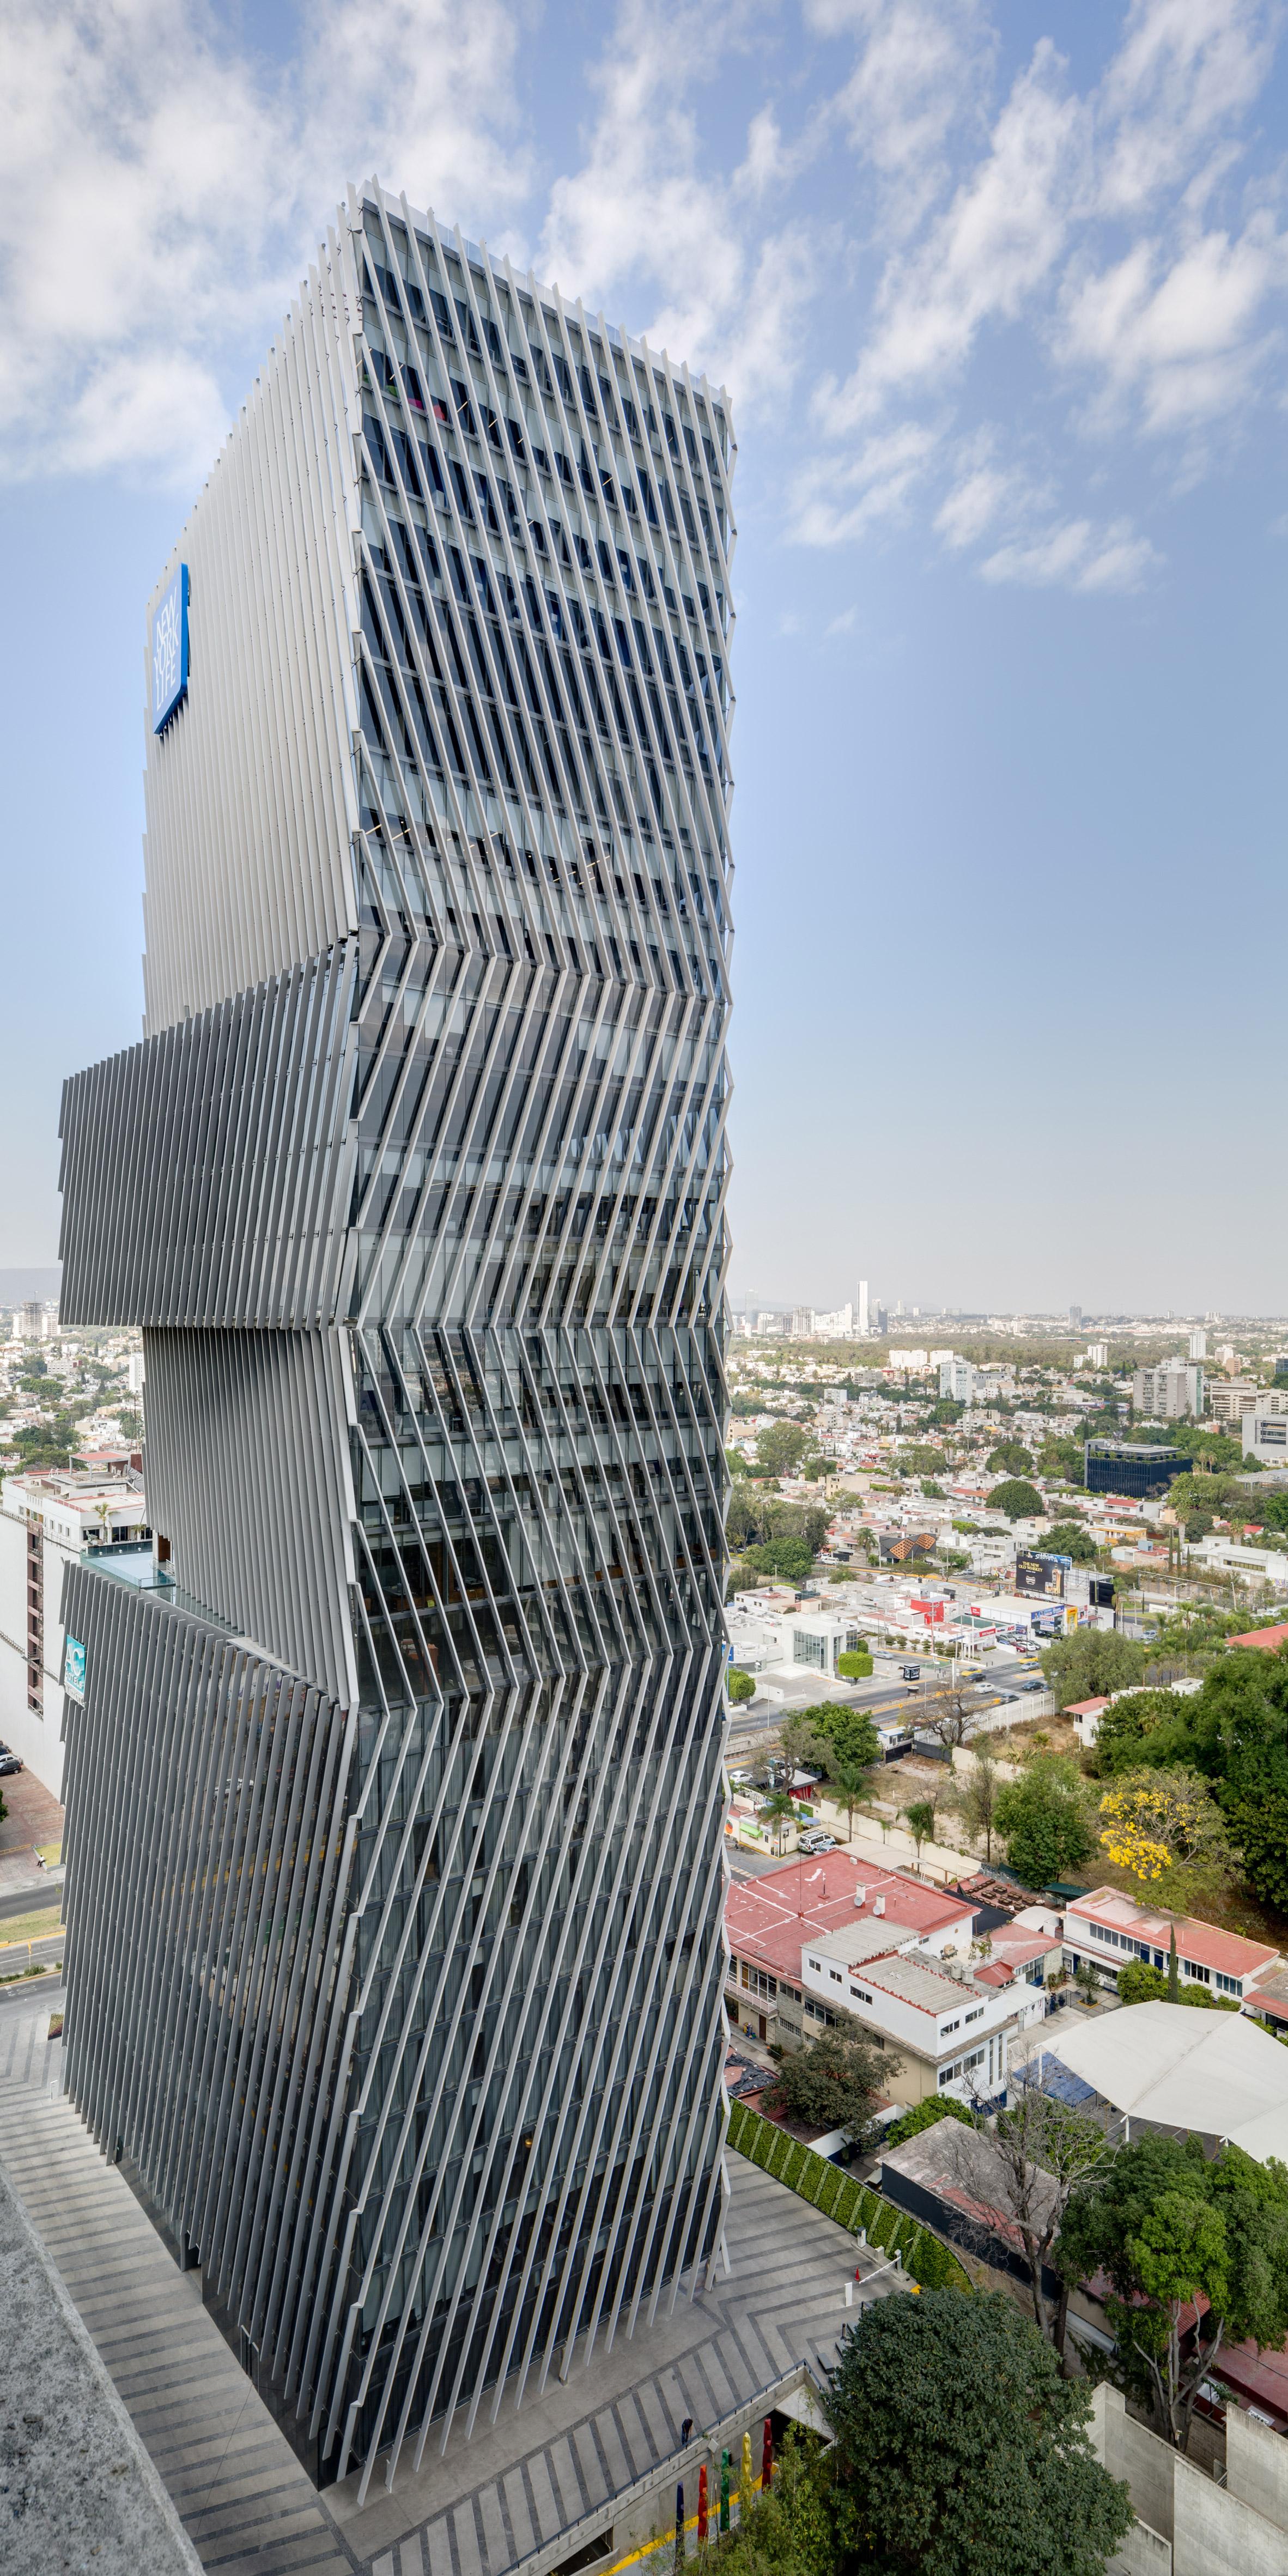 Angled louvres shade glass skyscraper in Guadalajara by Sordo Madelano Arquitectos